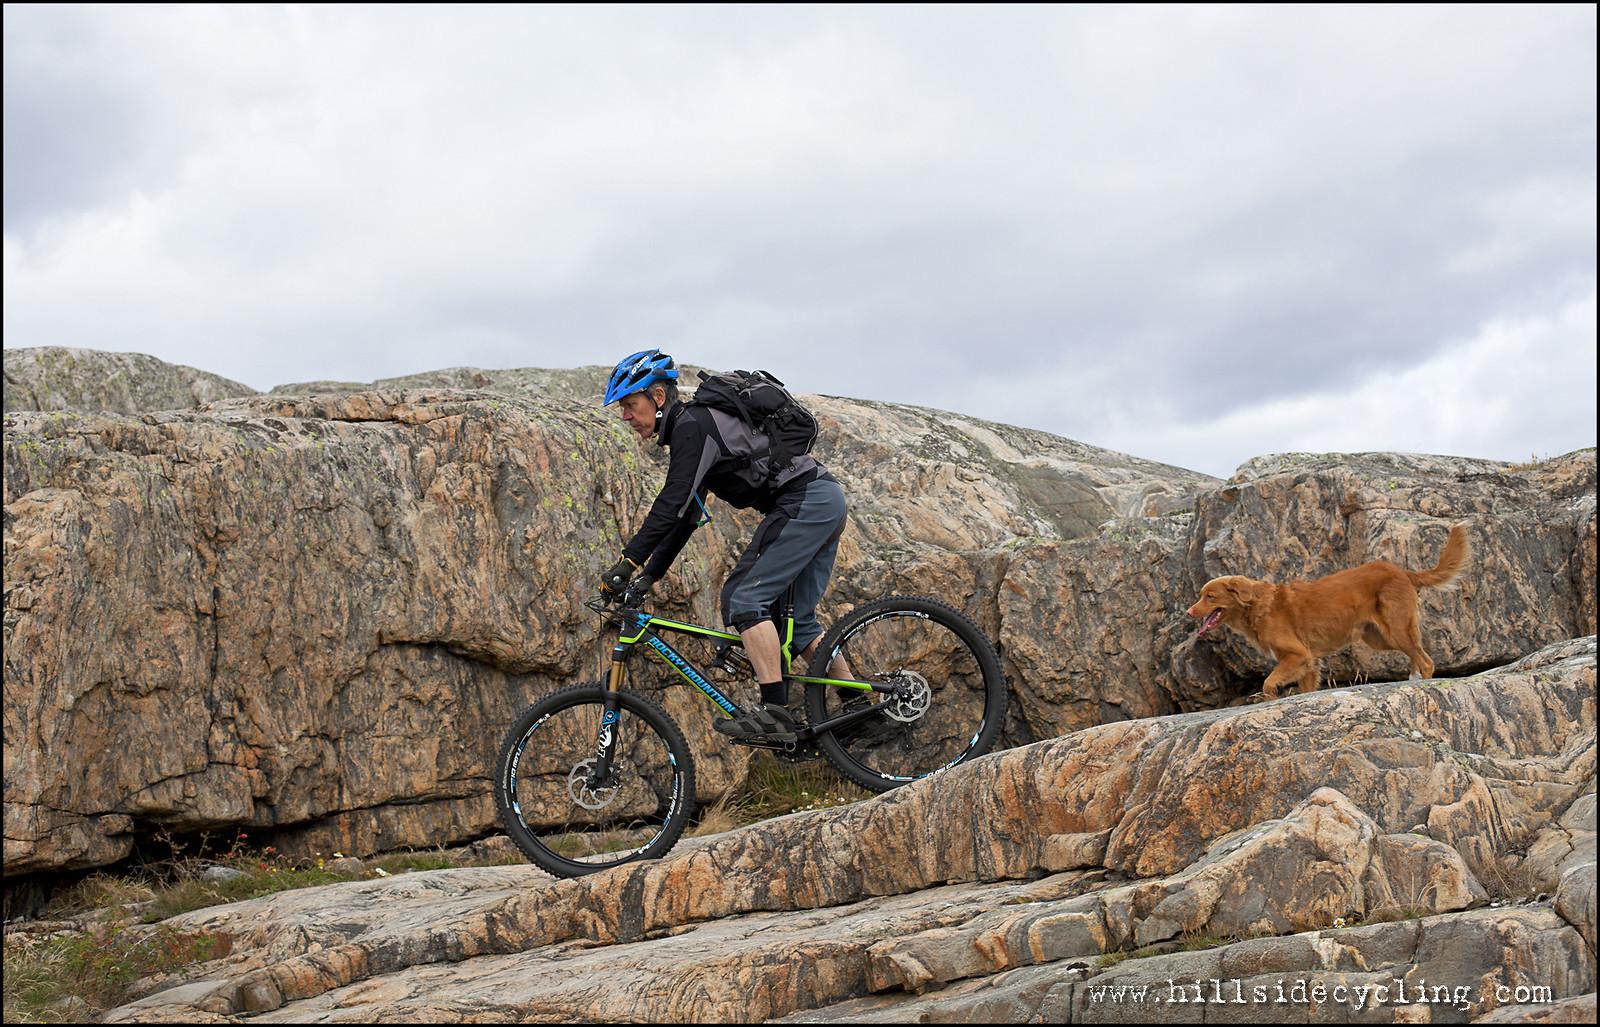 Rocky on the rocks! - Hillside Cycling - Mountain Biking Pictures - Vital MTB